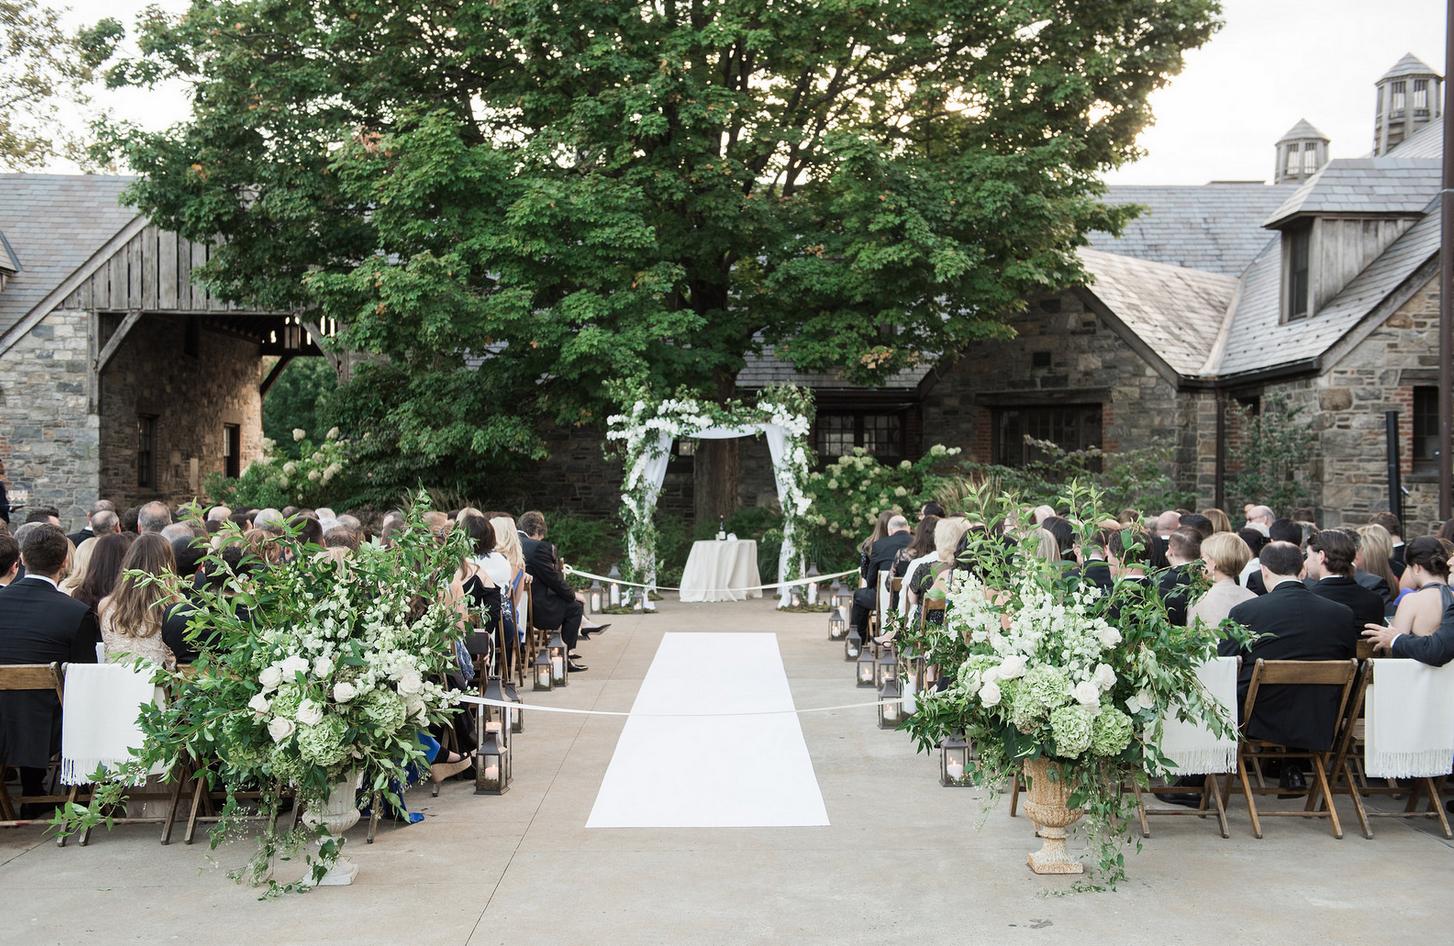 Elegant Affair Wedding at the Farm - Flowers by Denise Fasanello Flowers - Photos by Meg Miller 5.jpg